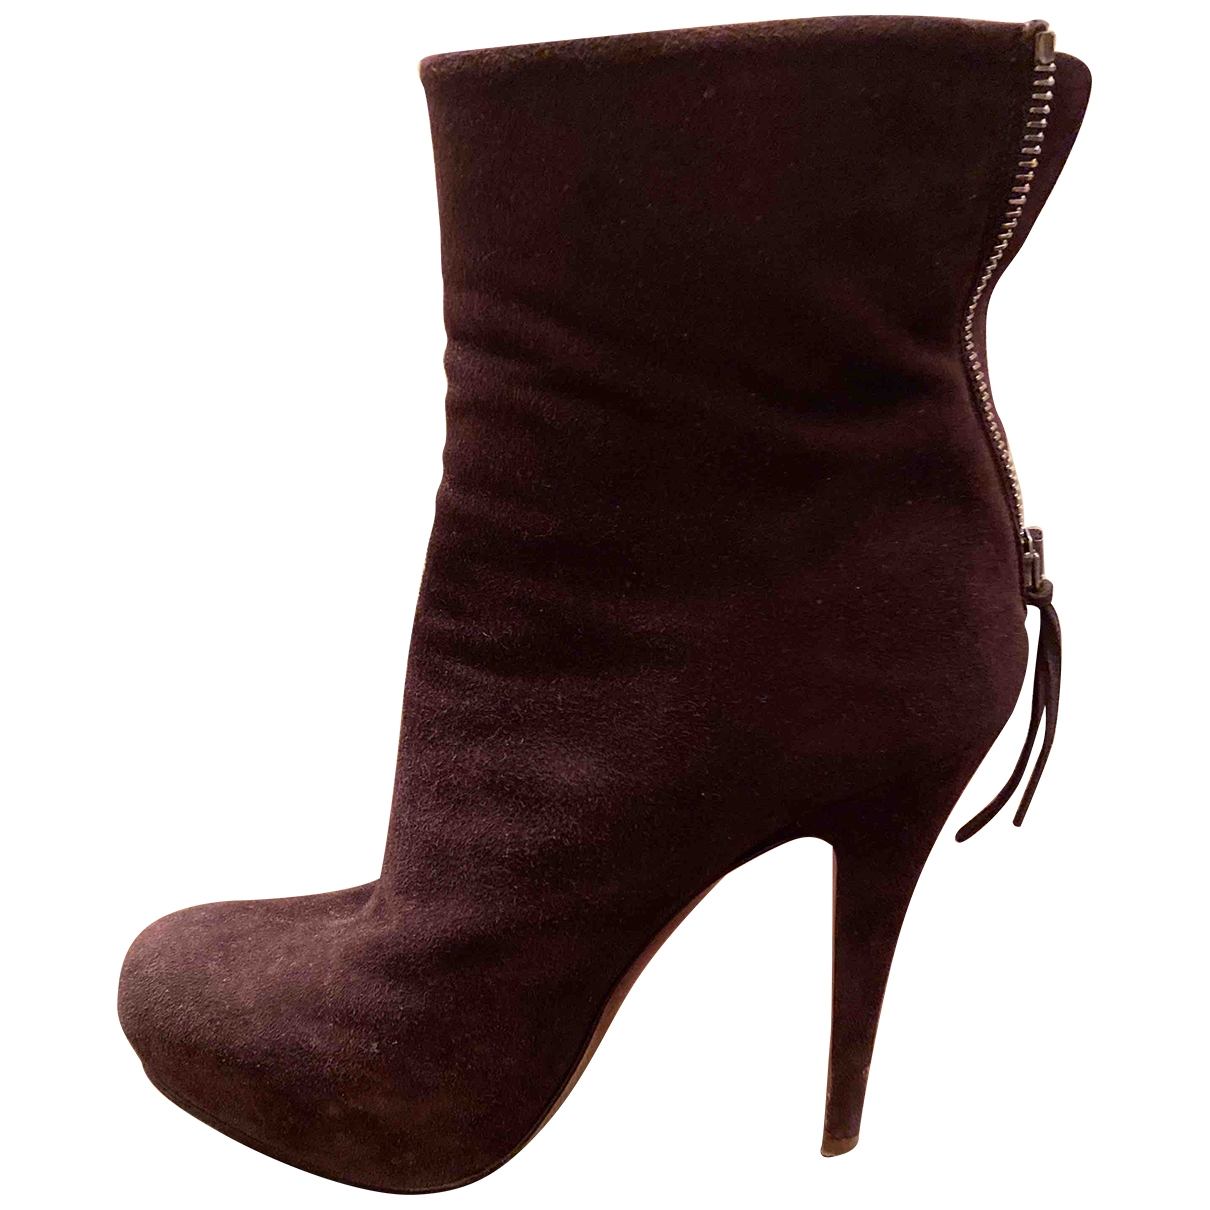 Miu Miu \N Brown Suede Ankle boots for Women 37 EU